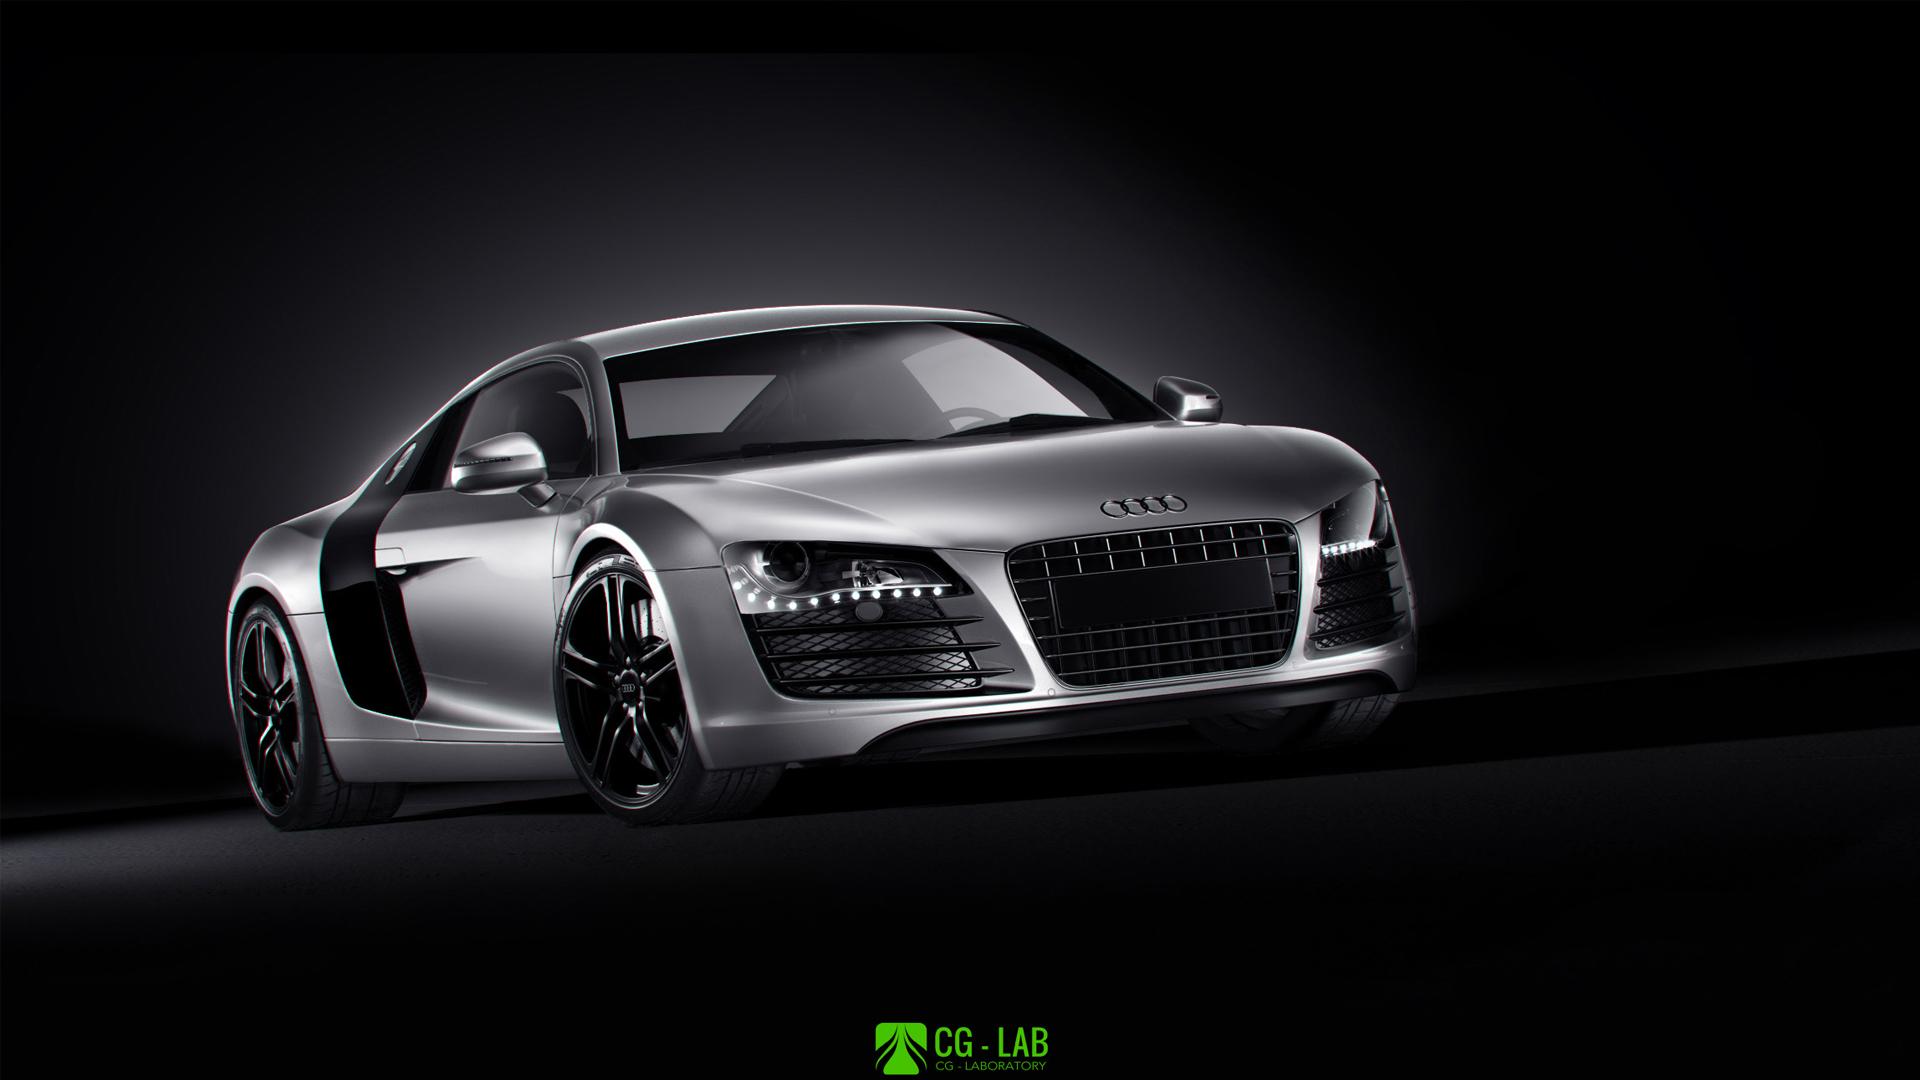 Audi R8 By Salimljabli On Deviantart